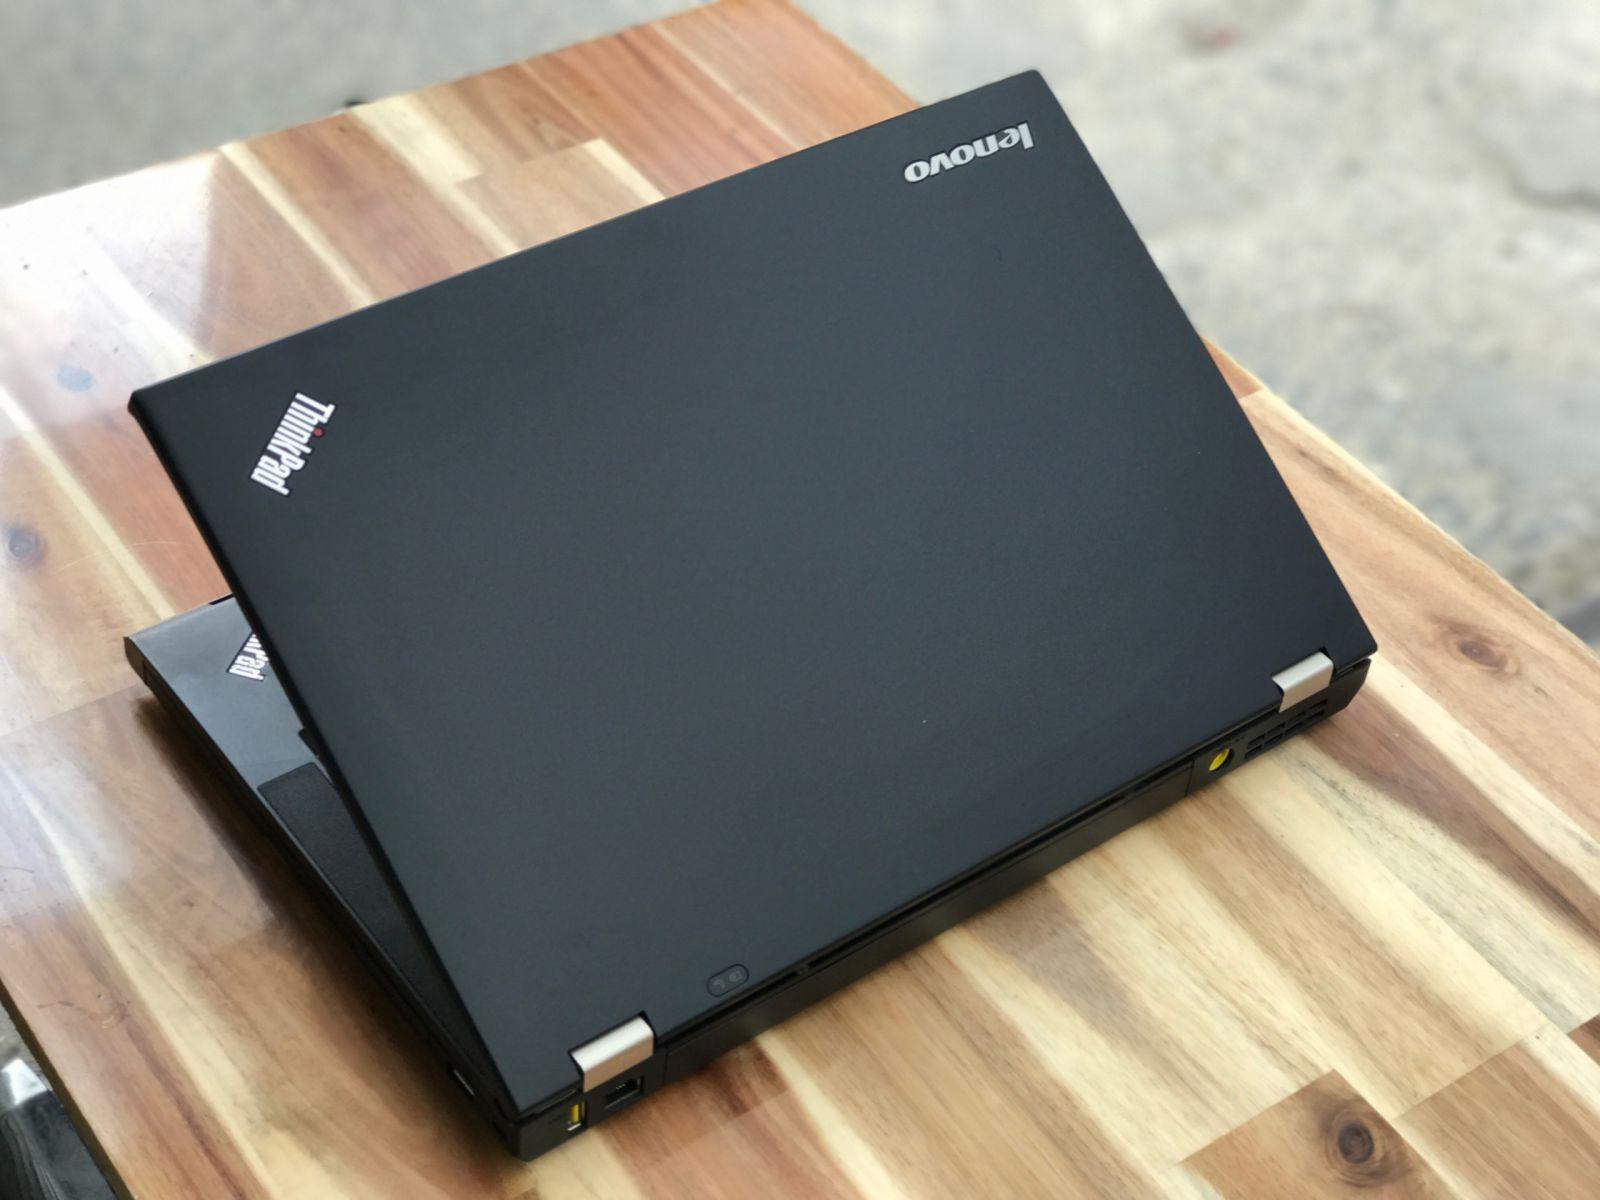 Laptop Lenovo Thinkpad T430, i5 3320M 4G 320G 14inch Đẹp zin 100% Giá - 3